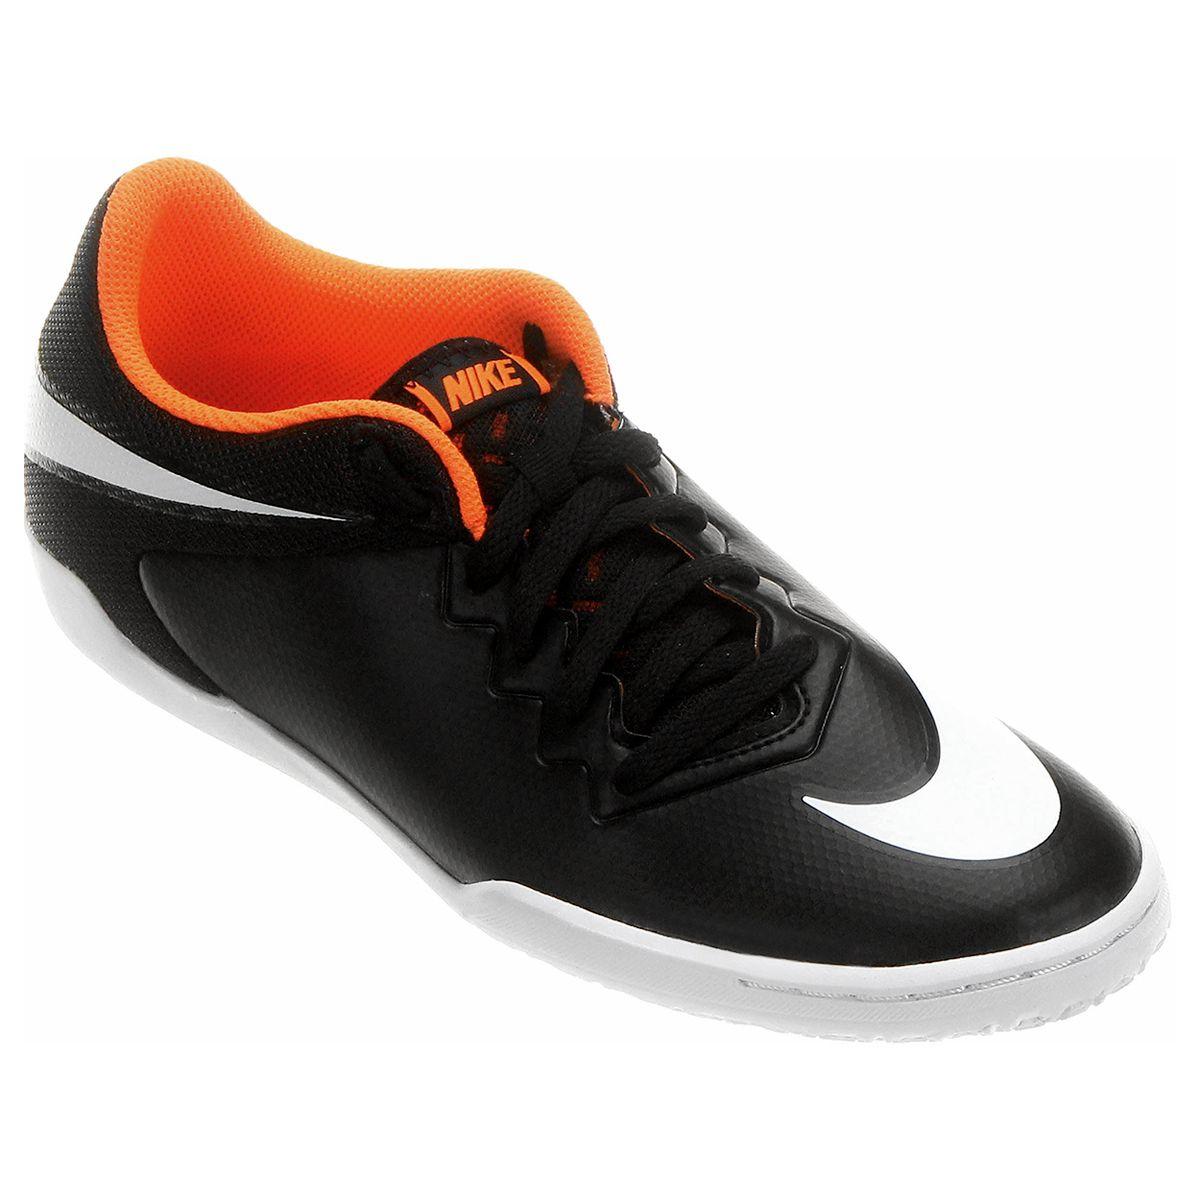 Chuteira Nike Hypervenom Pro Street IC Futsal Preto e Branco   Netshoes